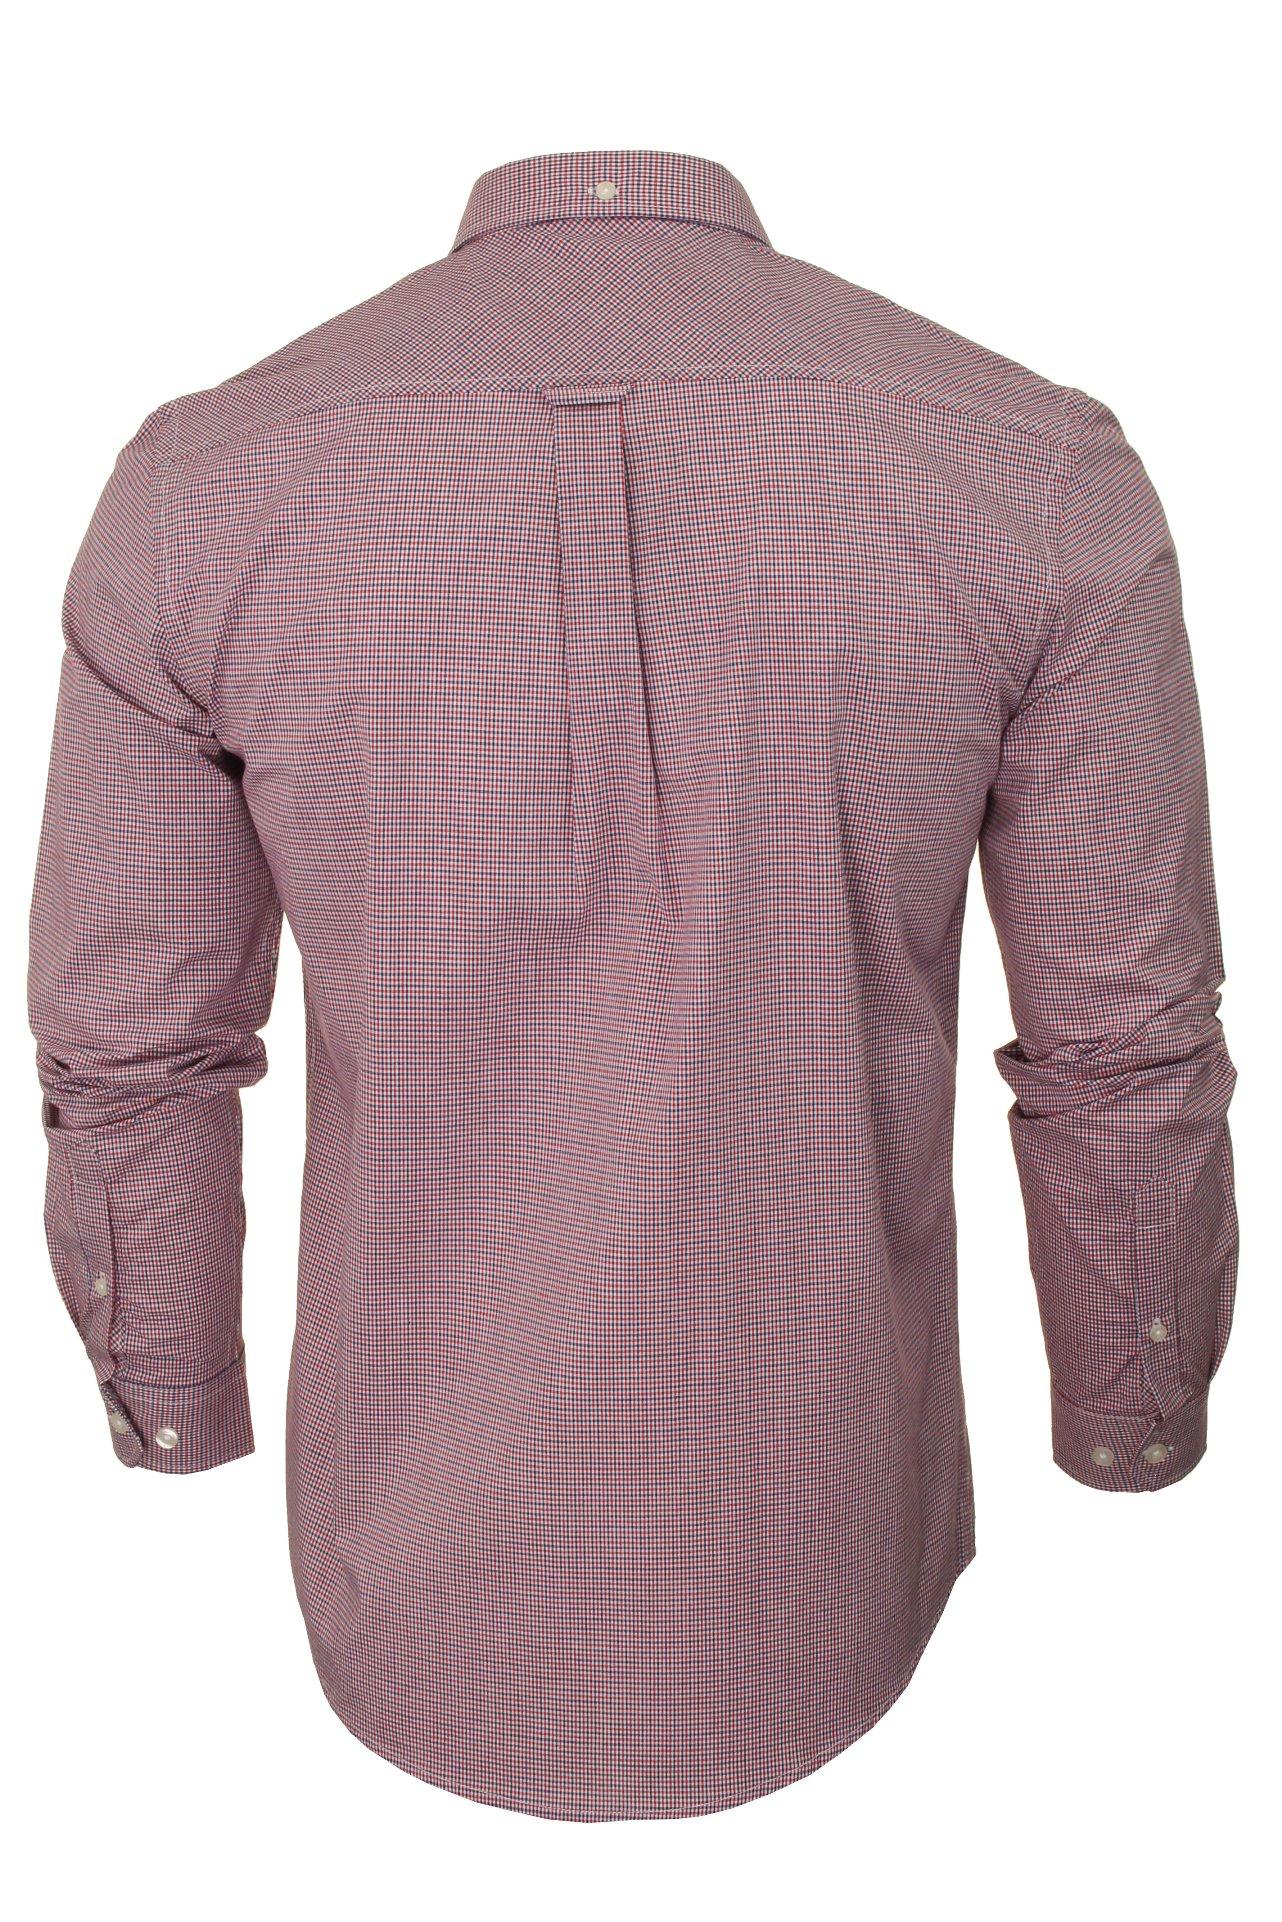 Ben-Sherman-Men-039-s-Long-Sleeved-Gingham-Check-Shirt miniatuur 8